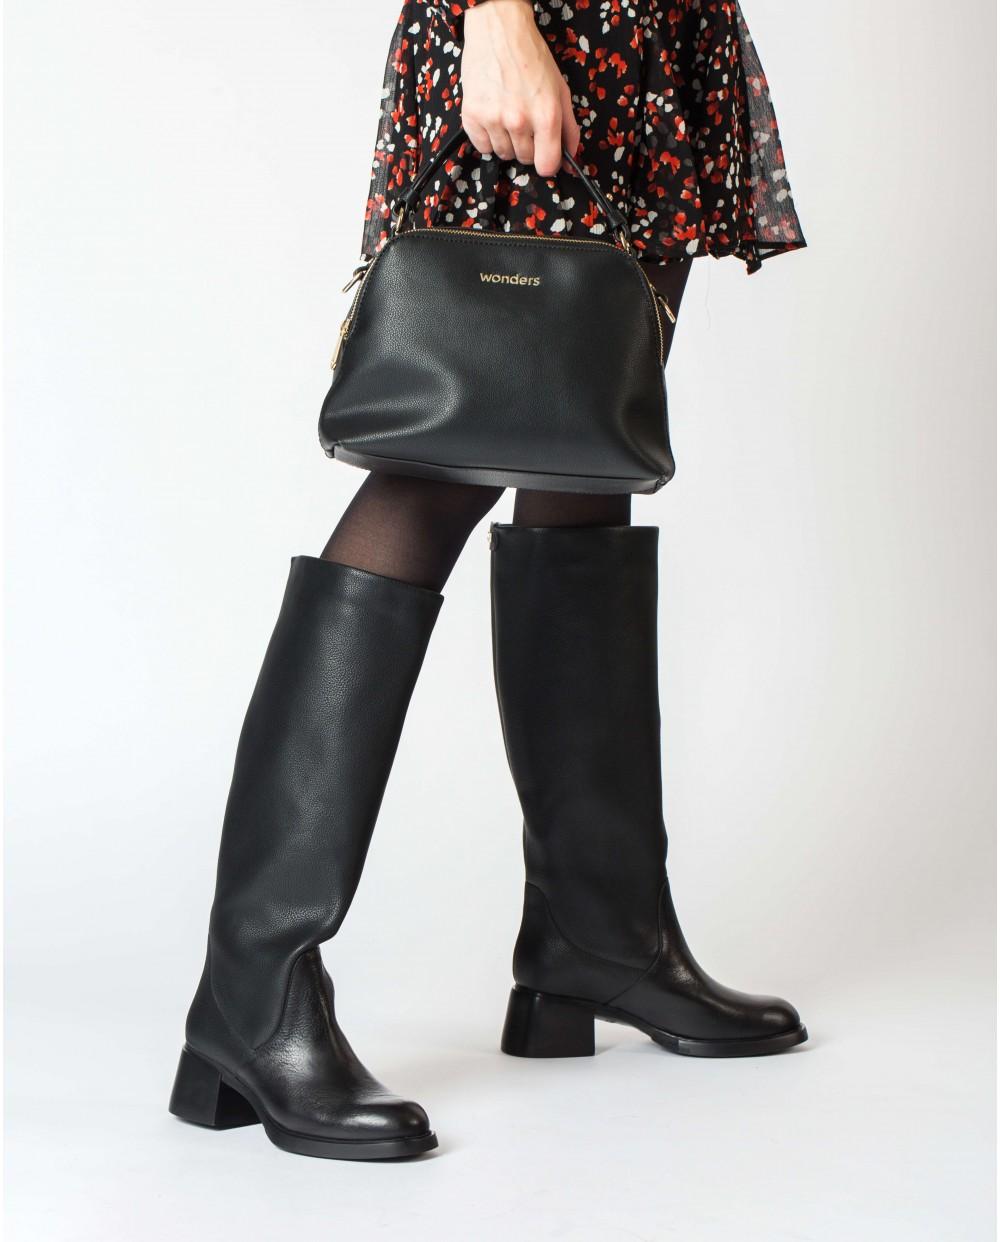 Wonders-Bags-Black Iris Bag